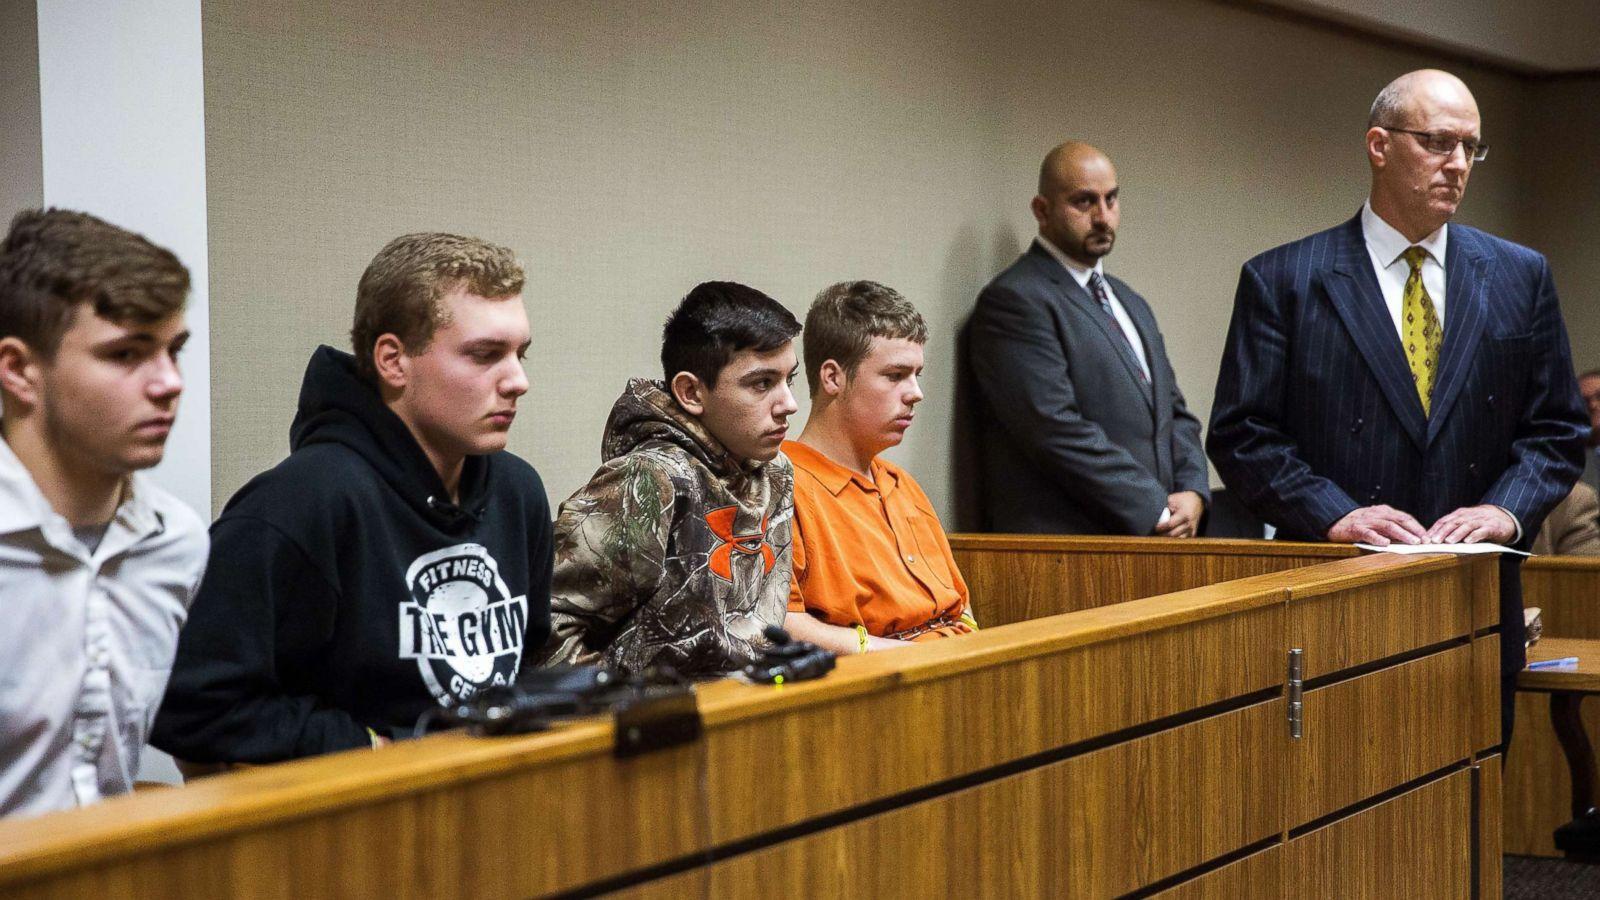 4 of 5 teens in deadly michigan rock throwing case accept plea deals